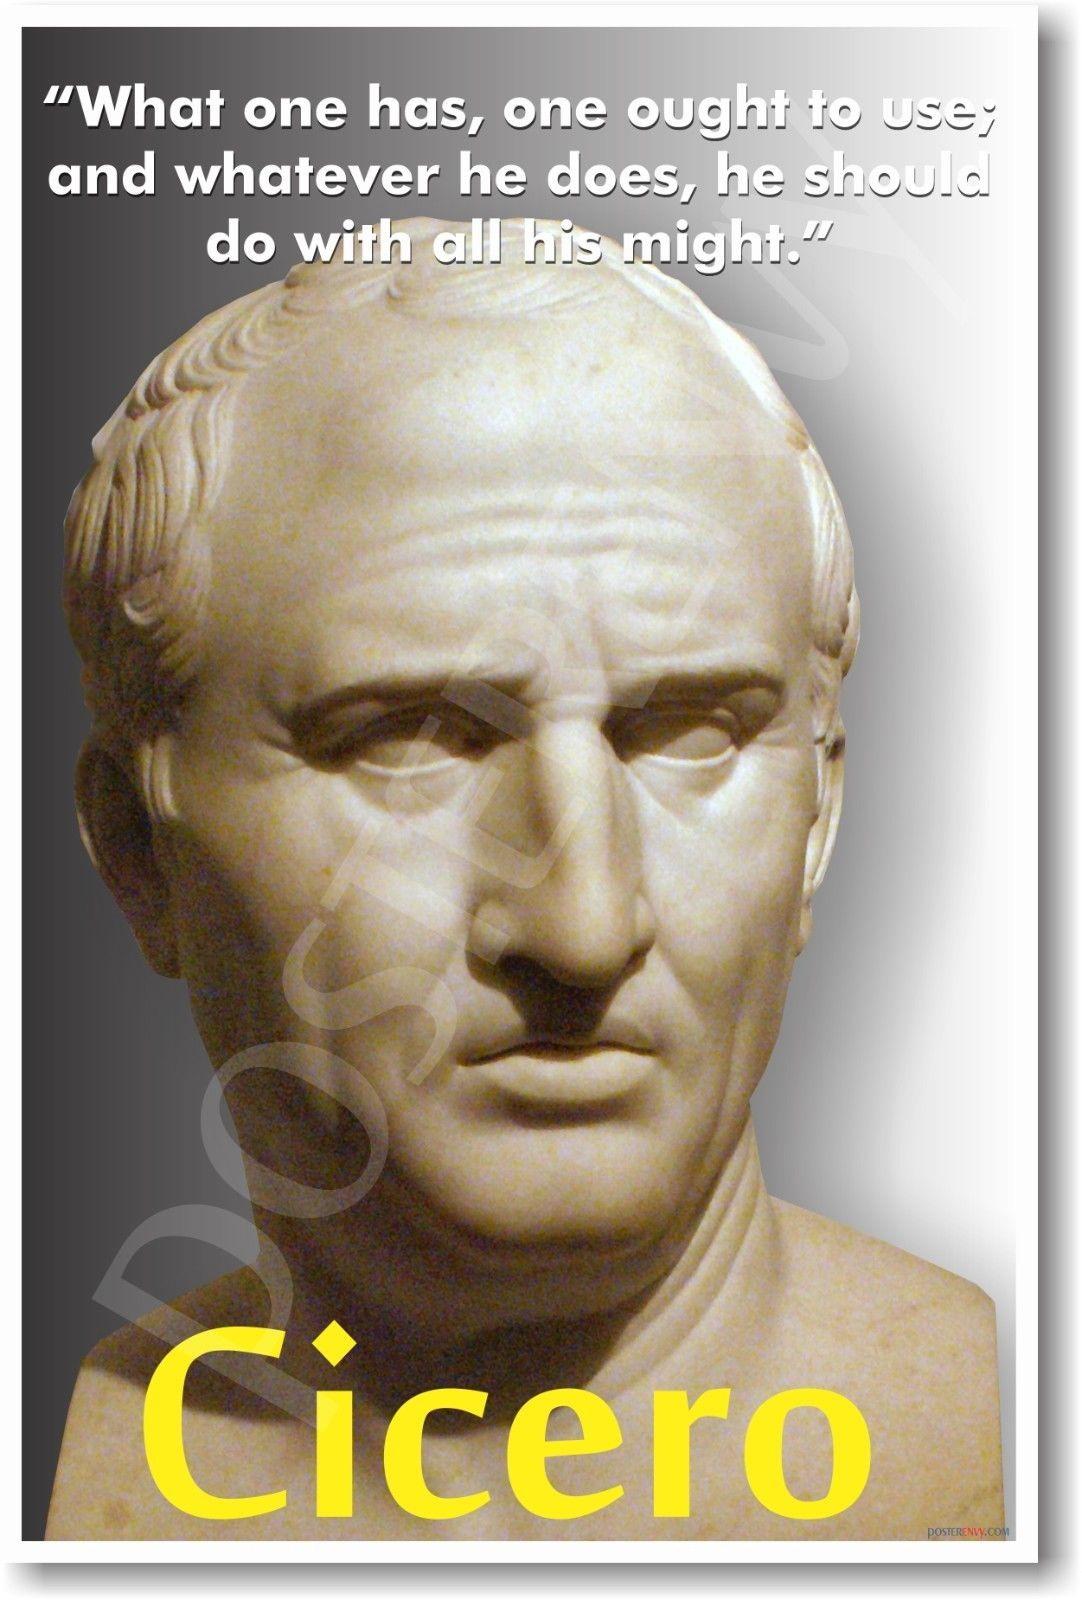 173284 Cicero Roman Latin History Decor WALL PRINT POSTER US